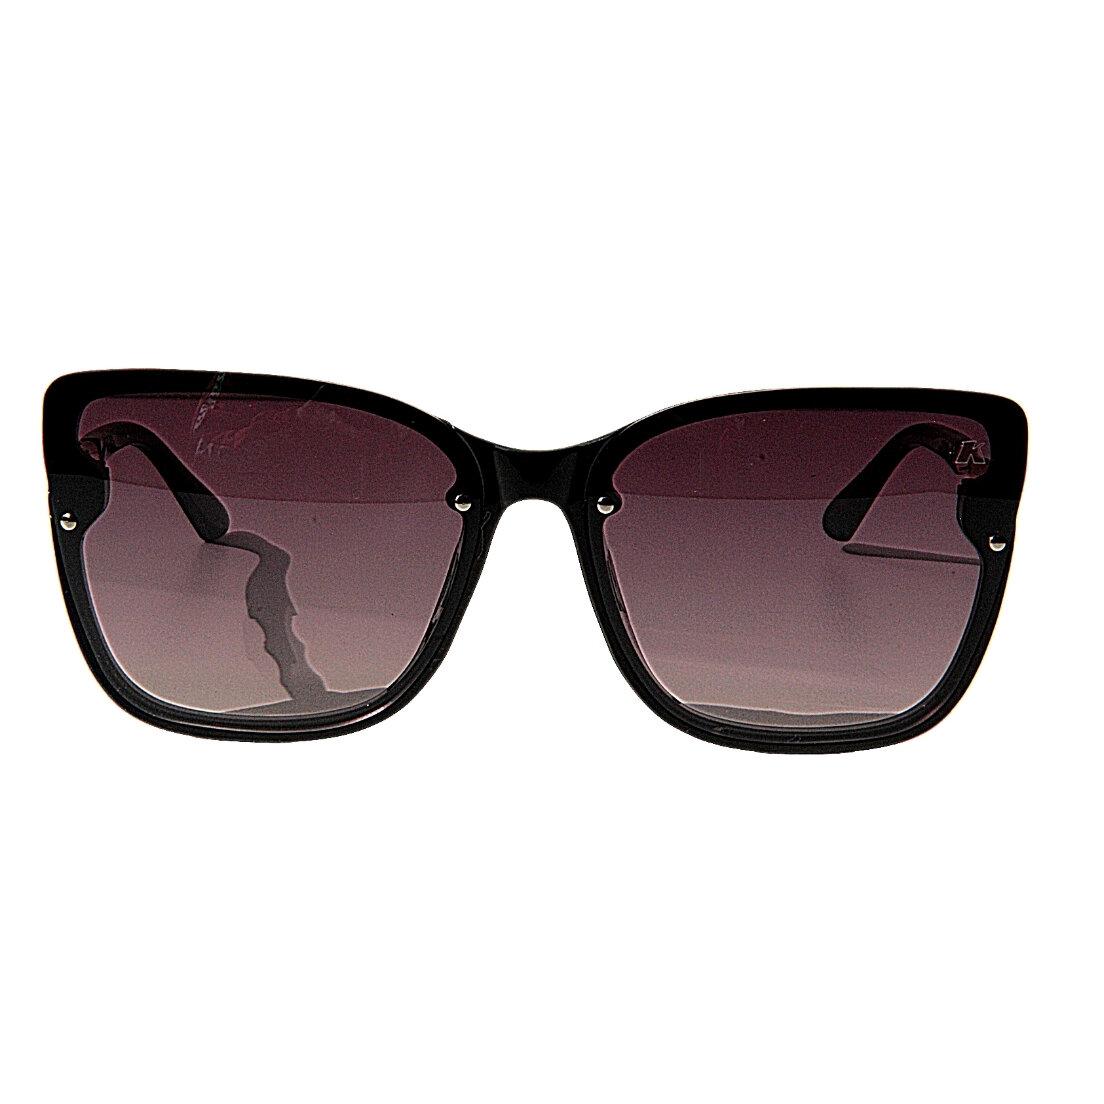 Óculos de Sol Khatto Square Fallon Black - C067